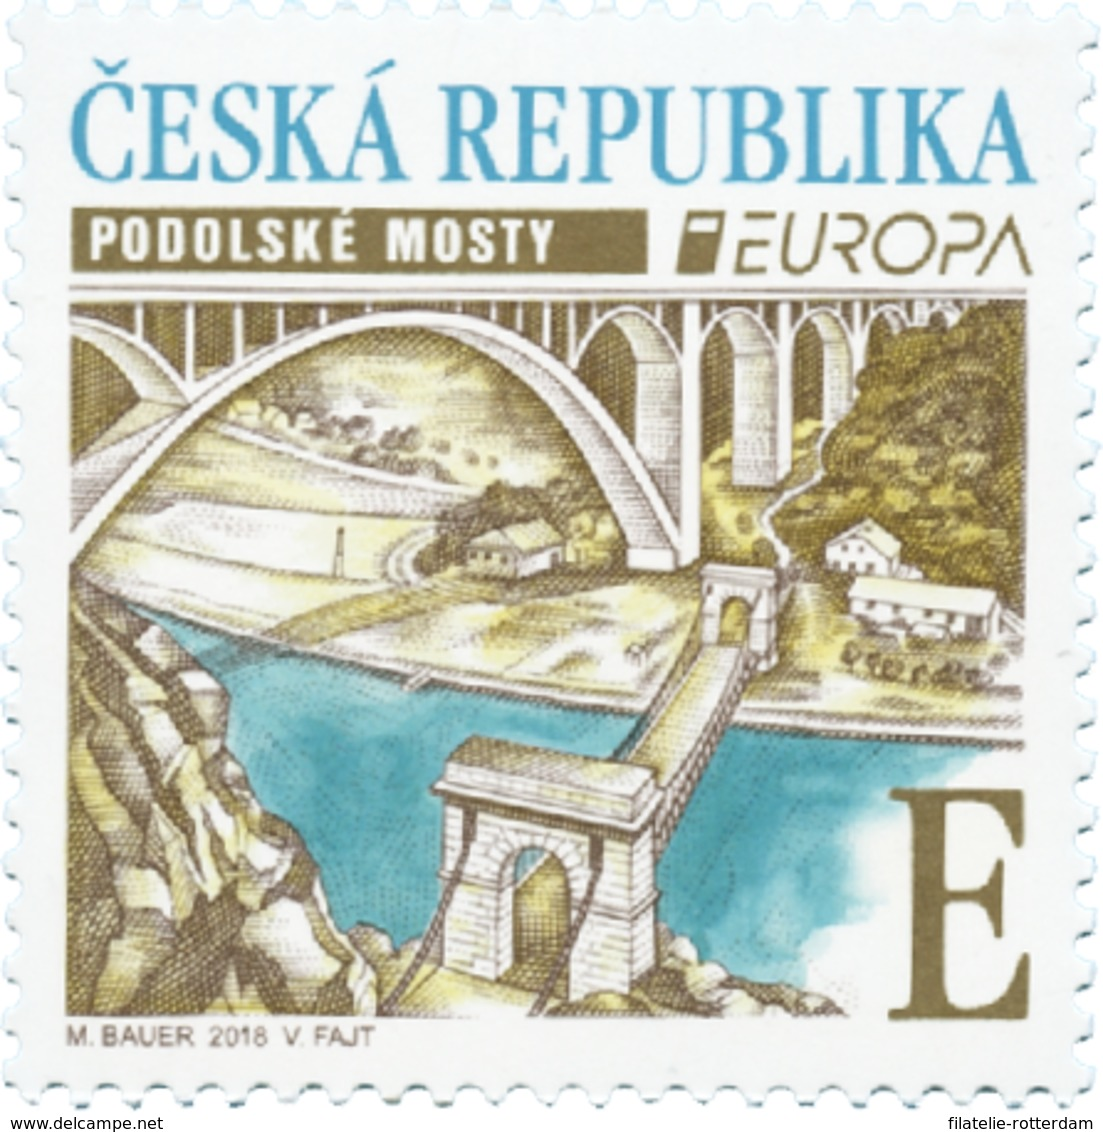 Tsjechië / Czech Republic - Postfris/MNH - Europa, Bruggen 2018 - Tsjechië